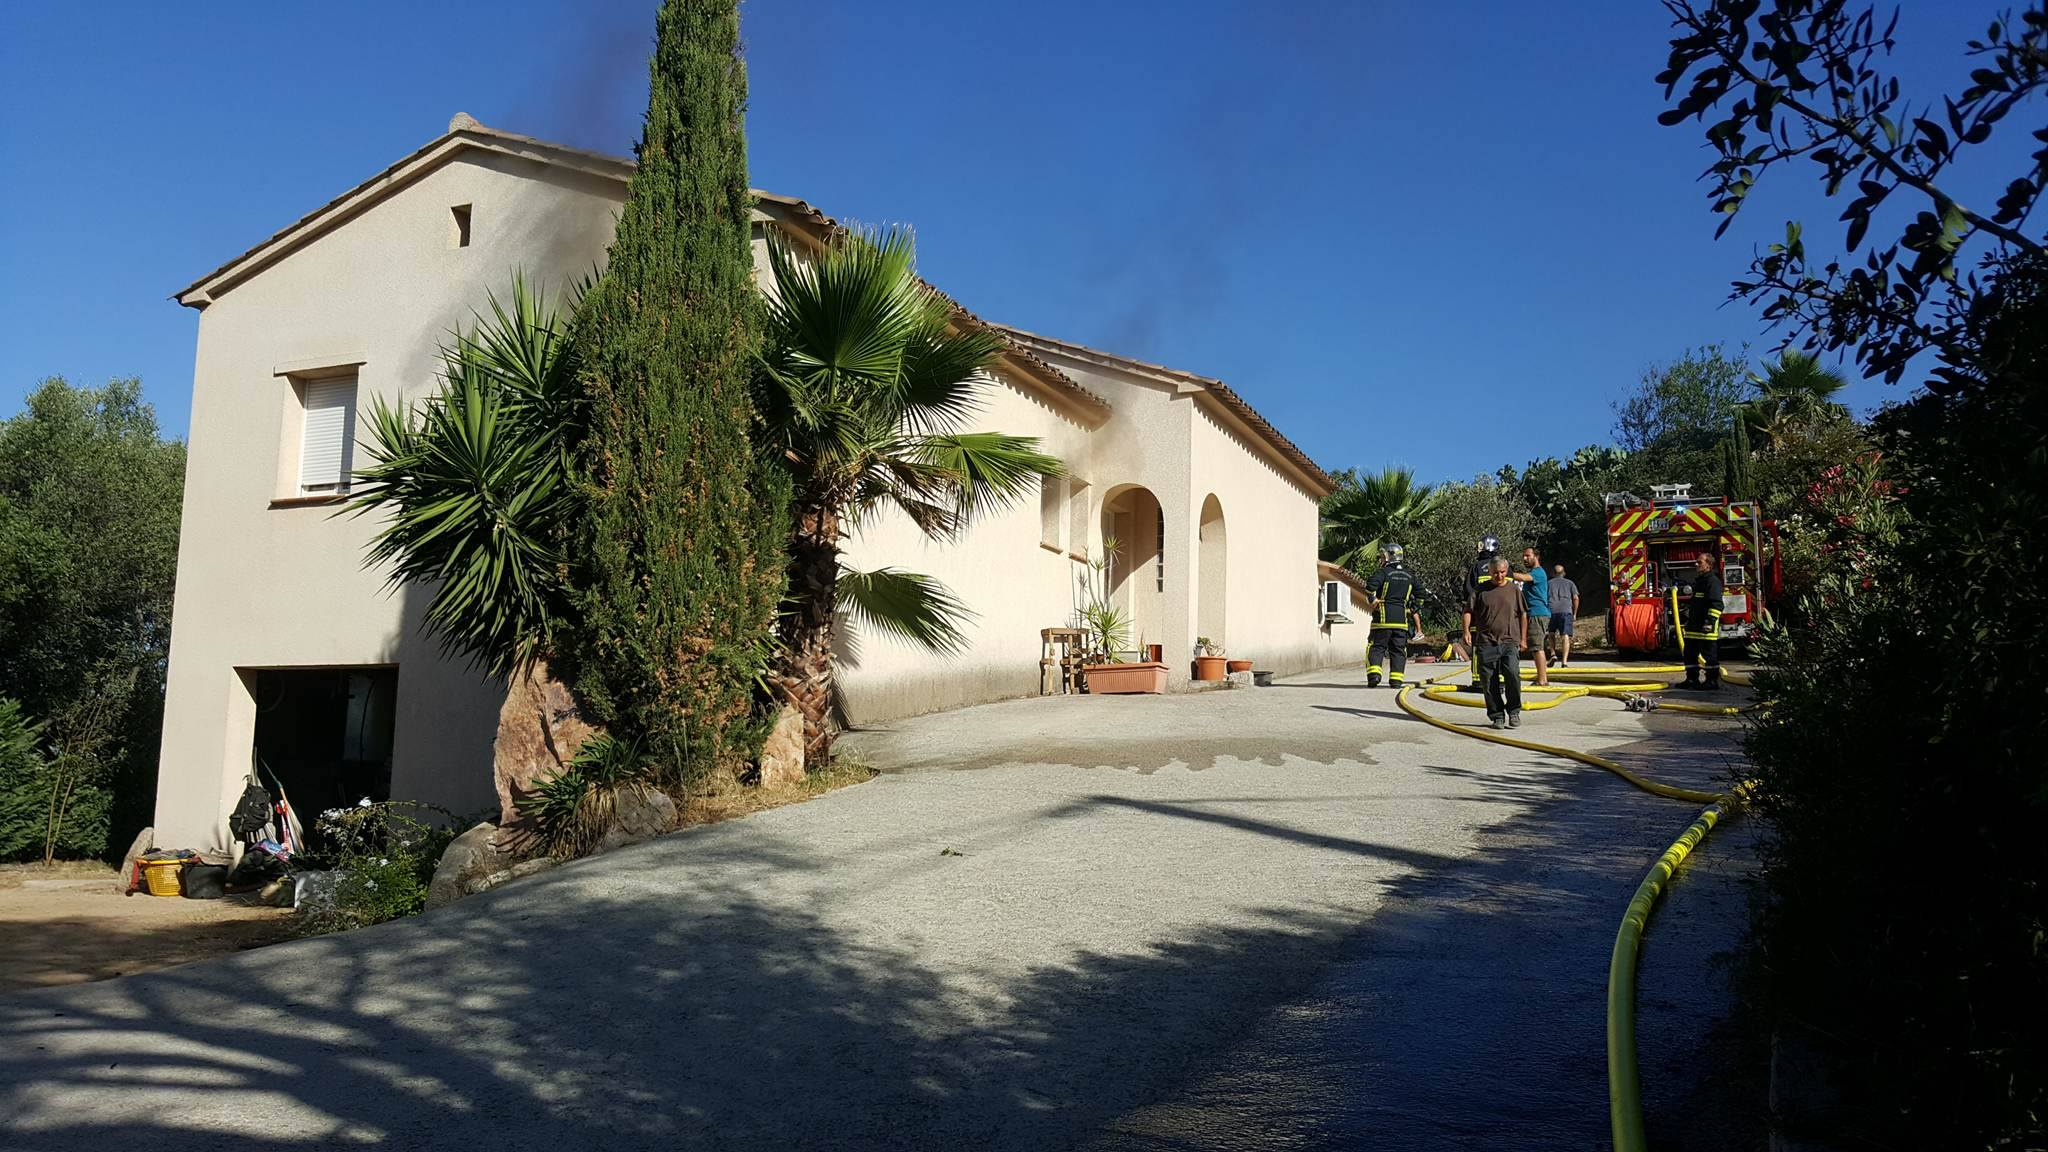 Bastelicaccia : Incendie dans une maison